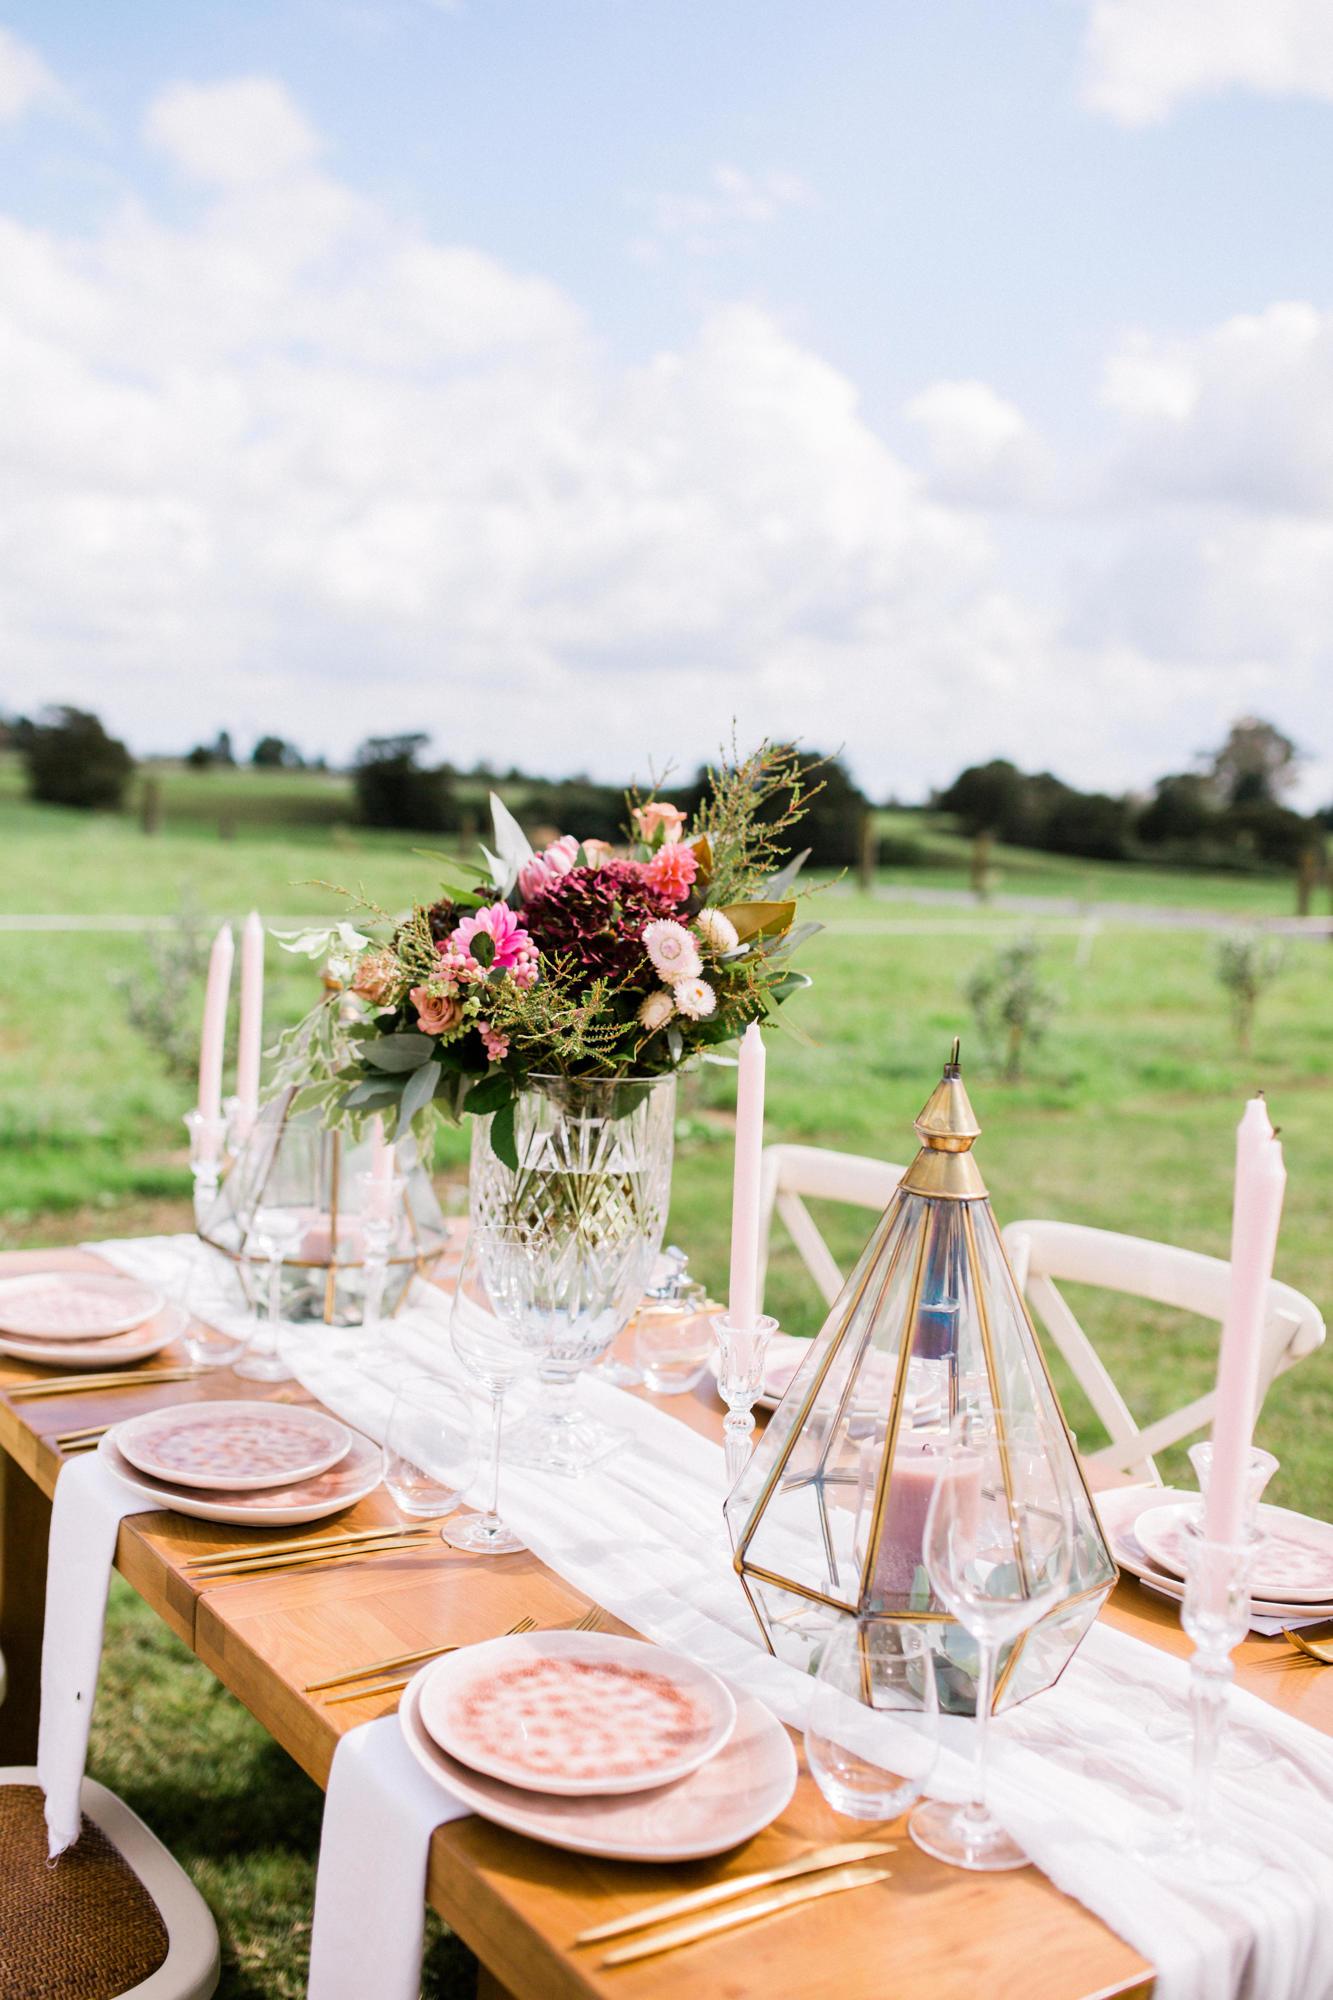 matamata country blush styled shoot © Sweet Events Photography 2018-6839.jpg